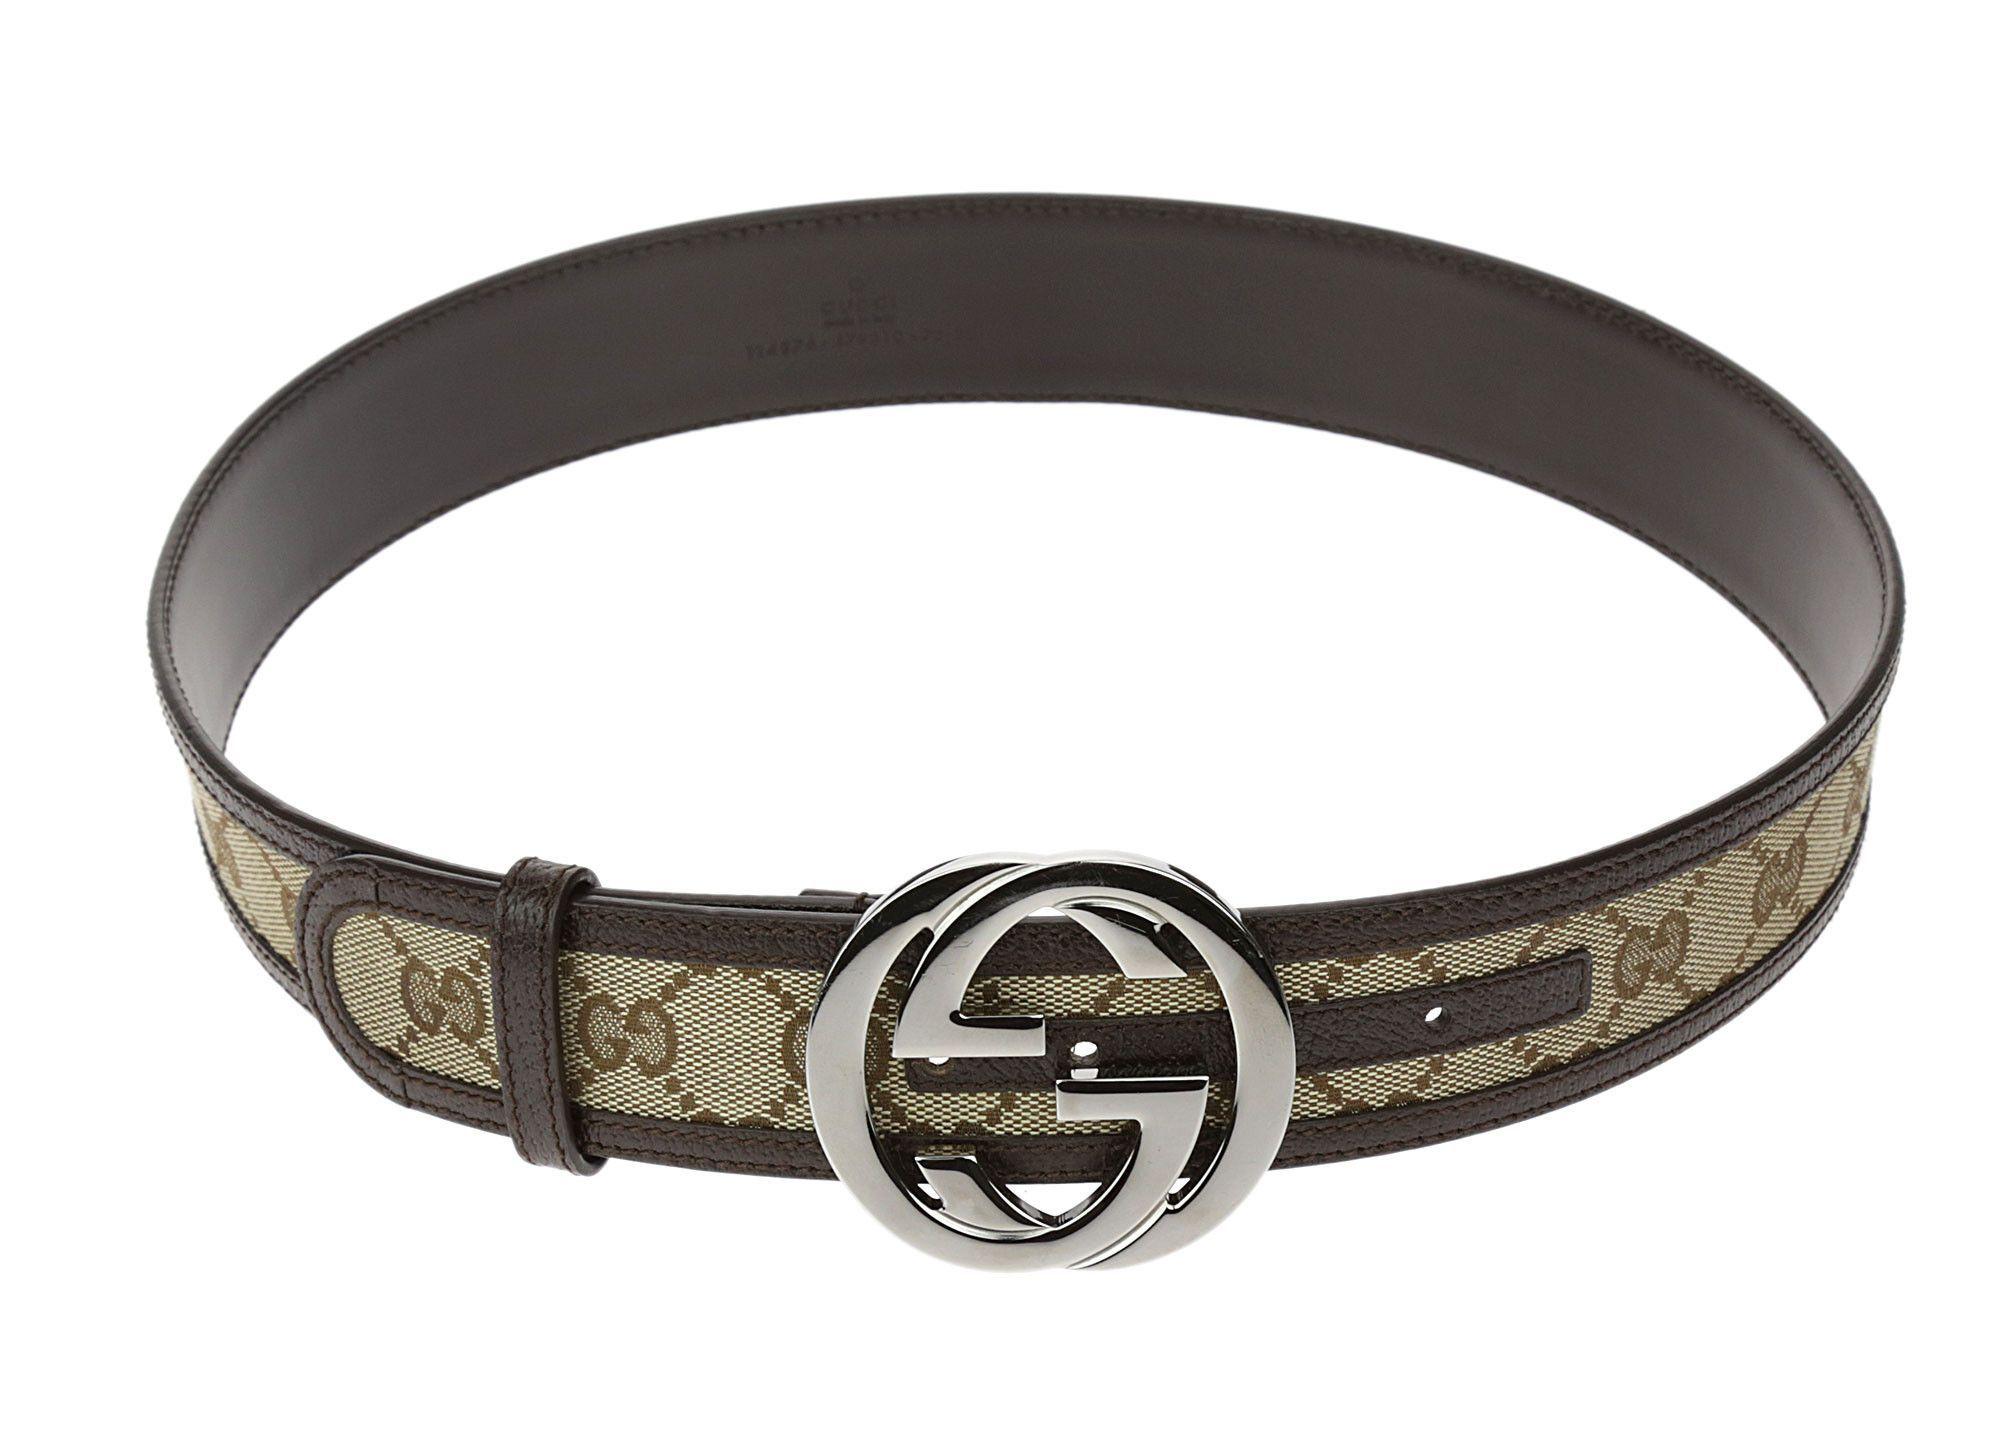 232df18e2 Gucci Brown GG Monogram Belt Interlocking G Buckle 75/30 | Gucci ...